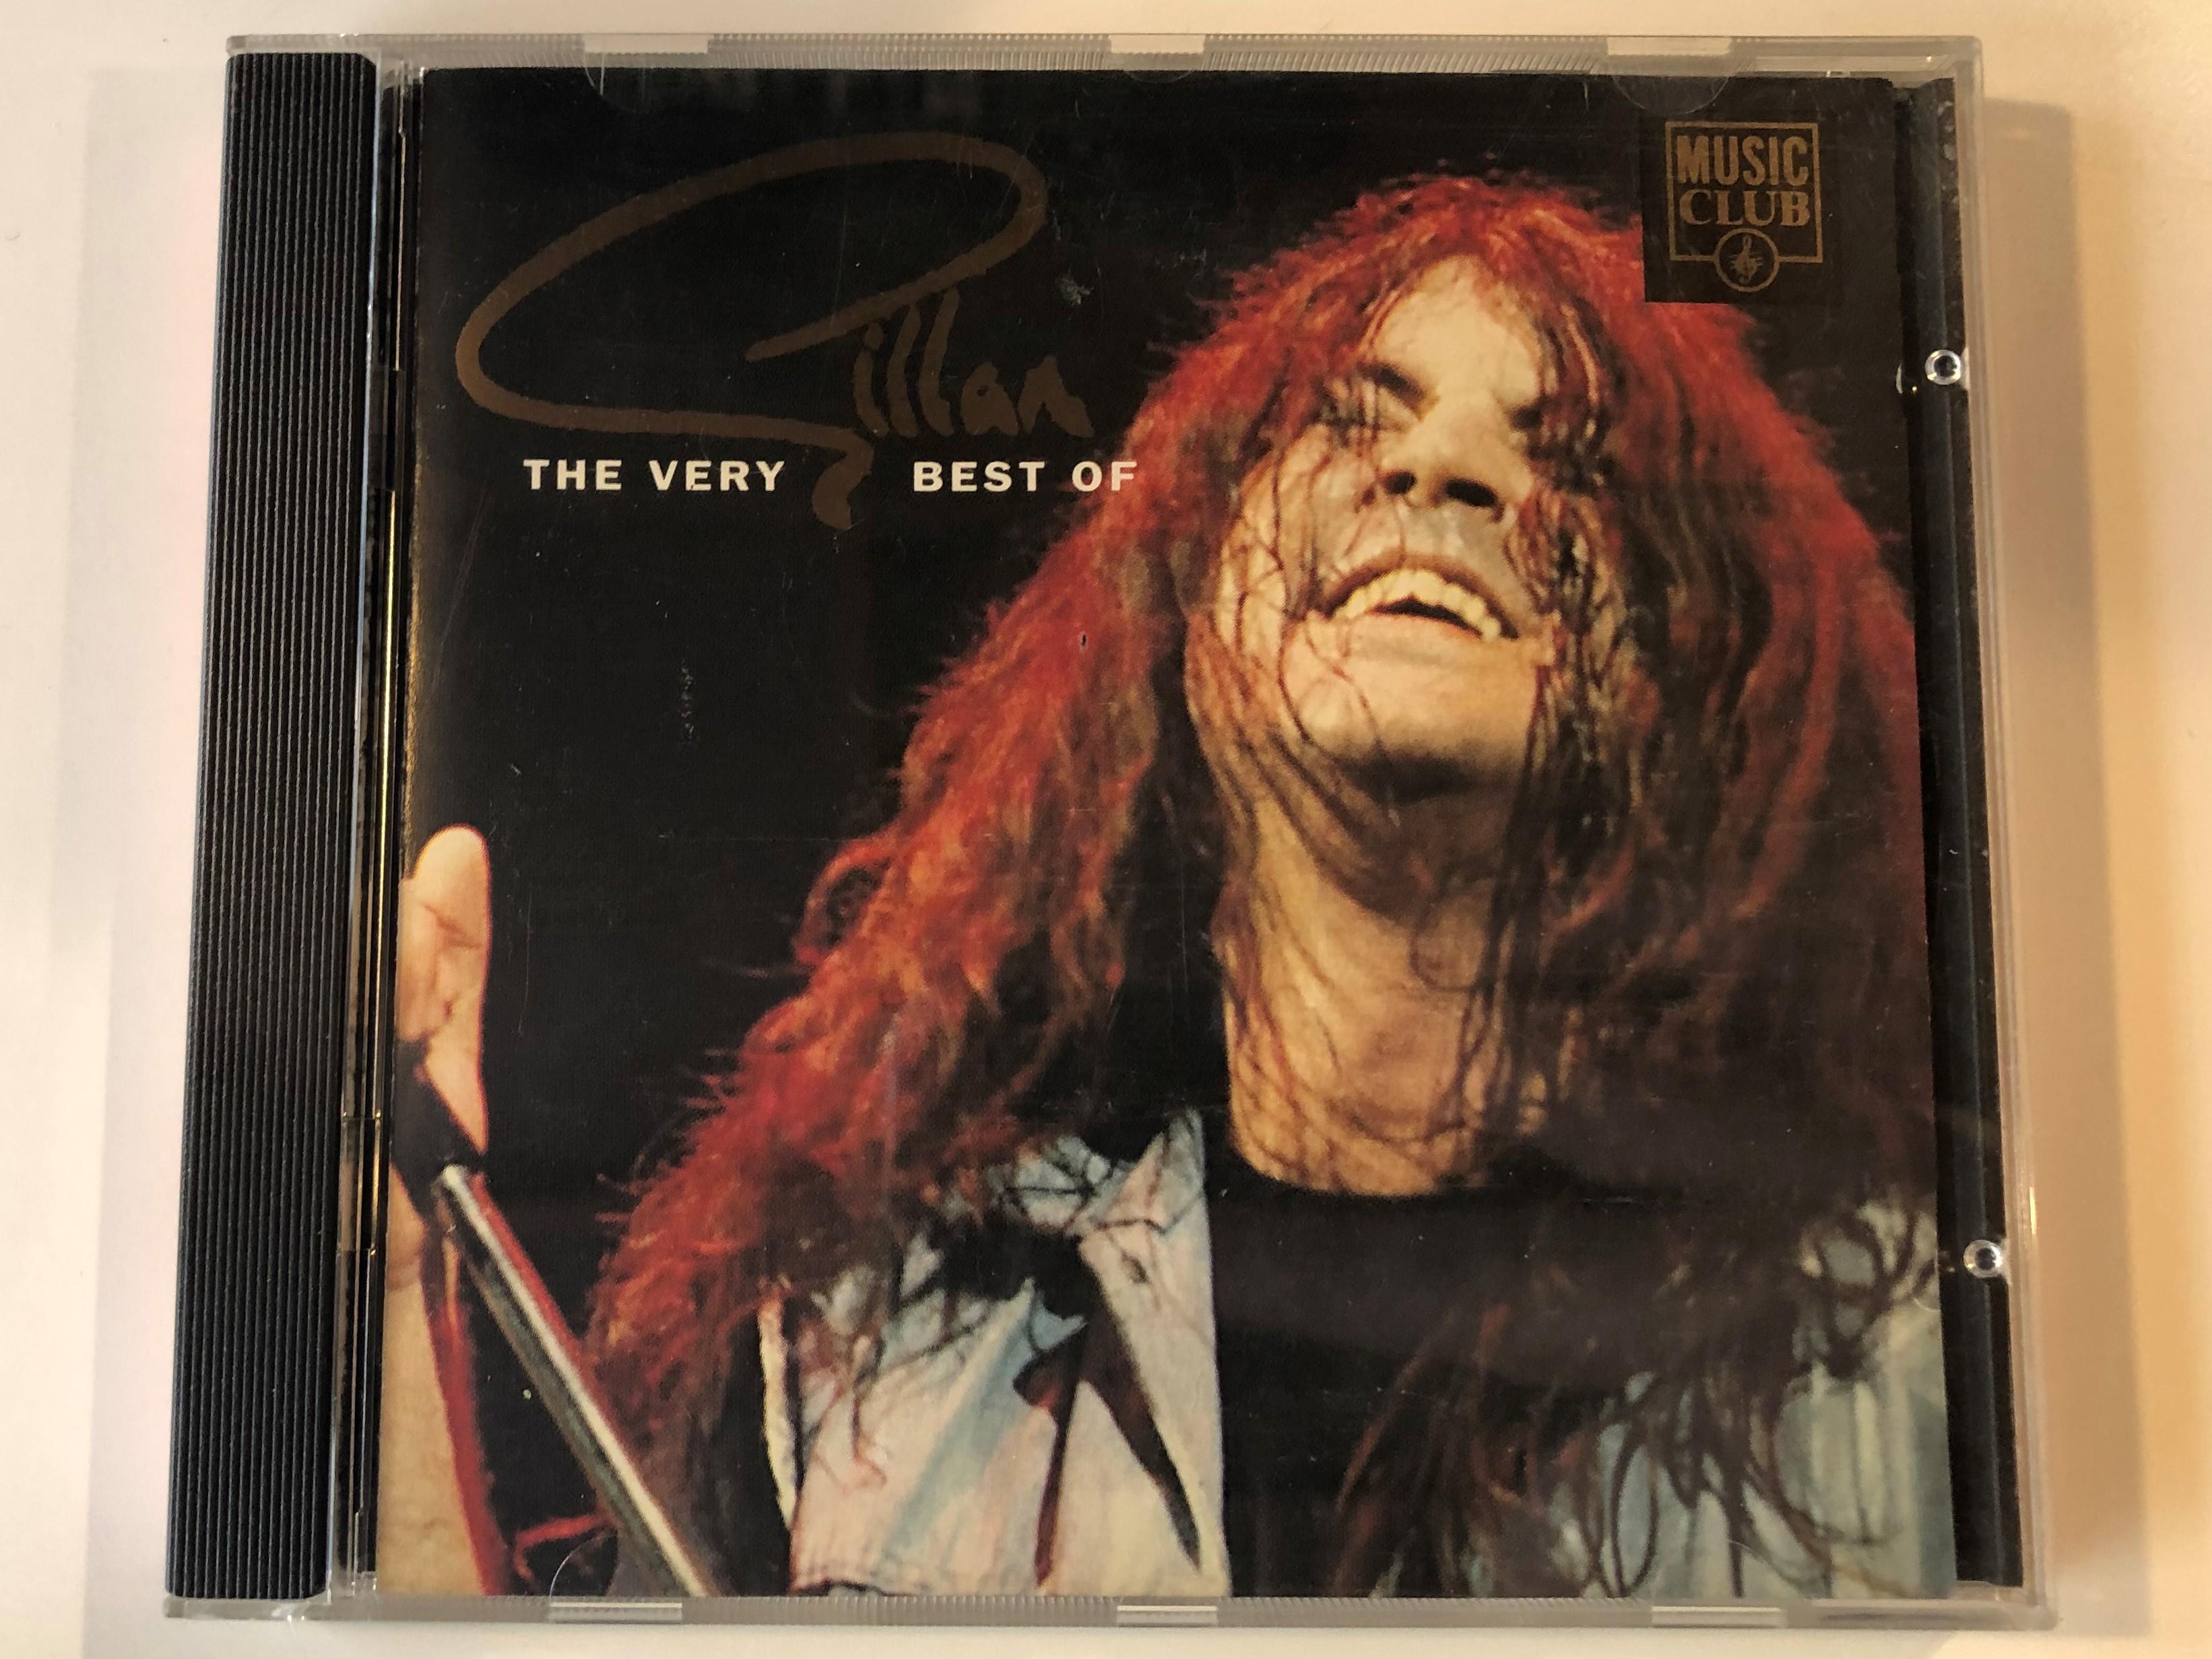 the-very-best-of-gillan-music-club-audio-cd-1991-mccd-032-1-.jpg